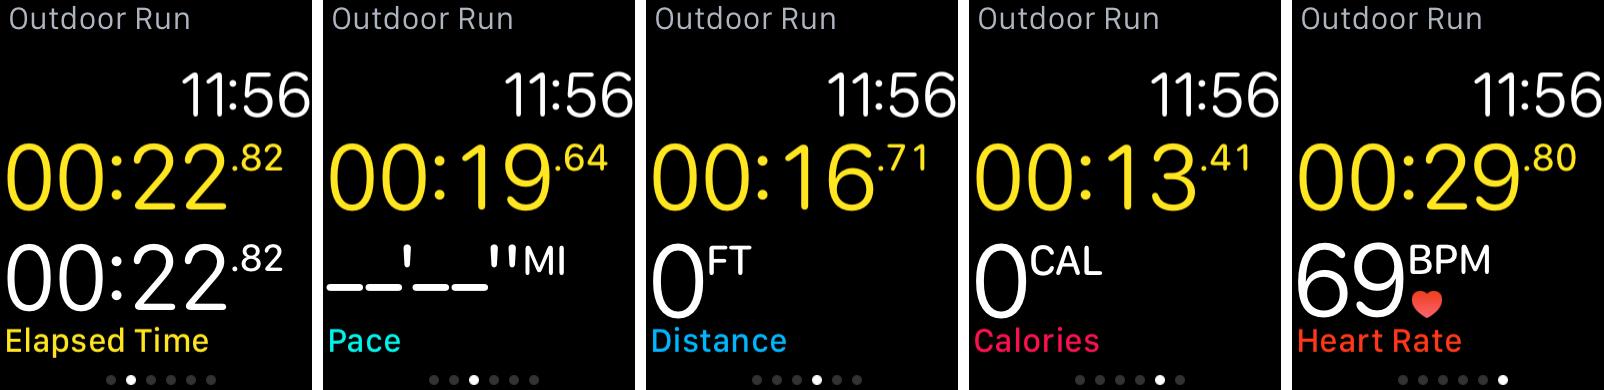 apple-watch-outdoor-run